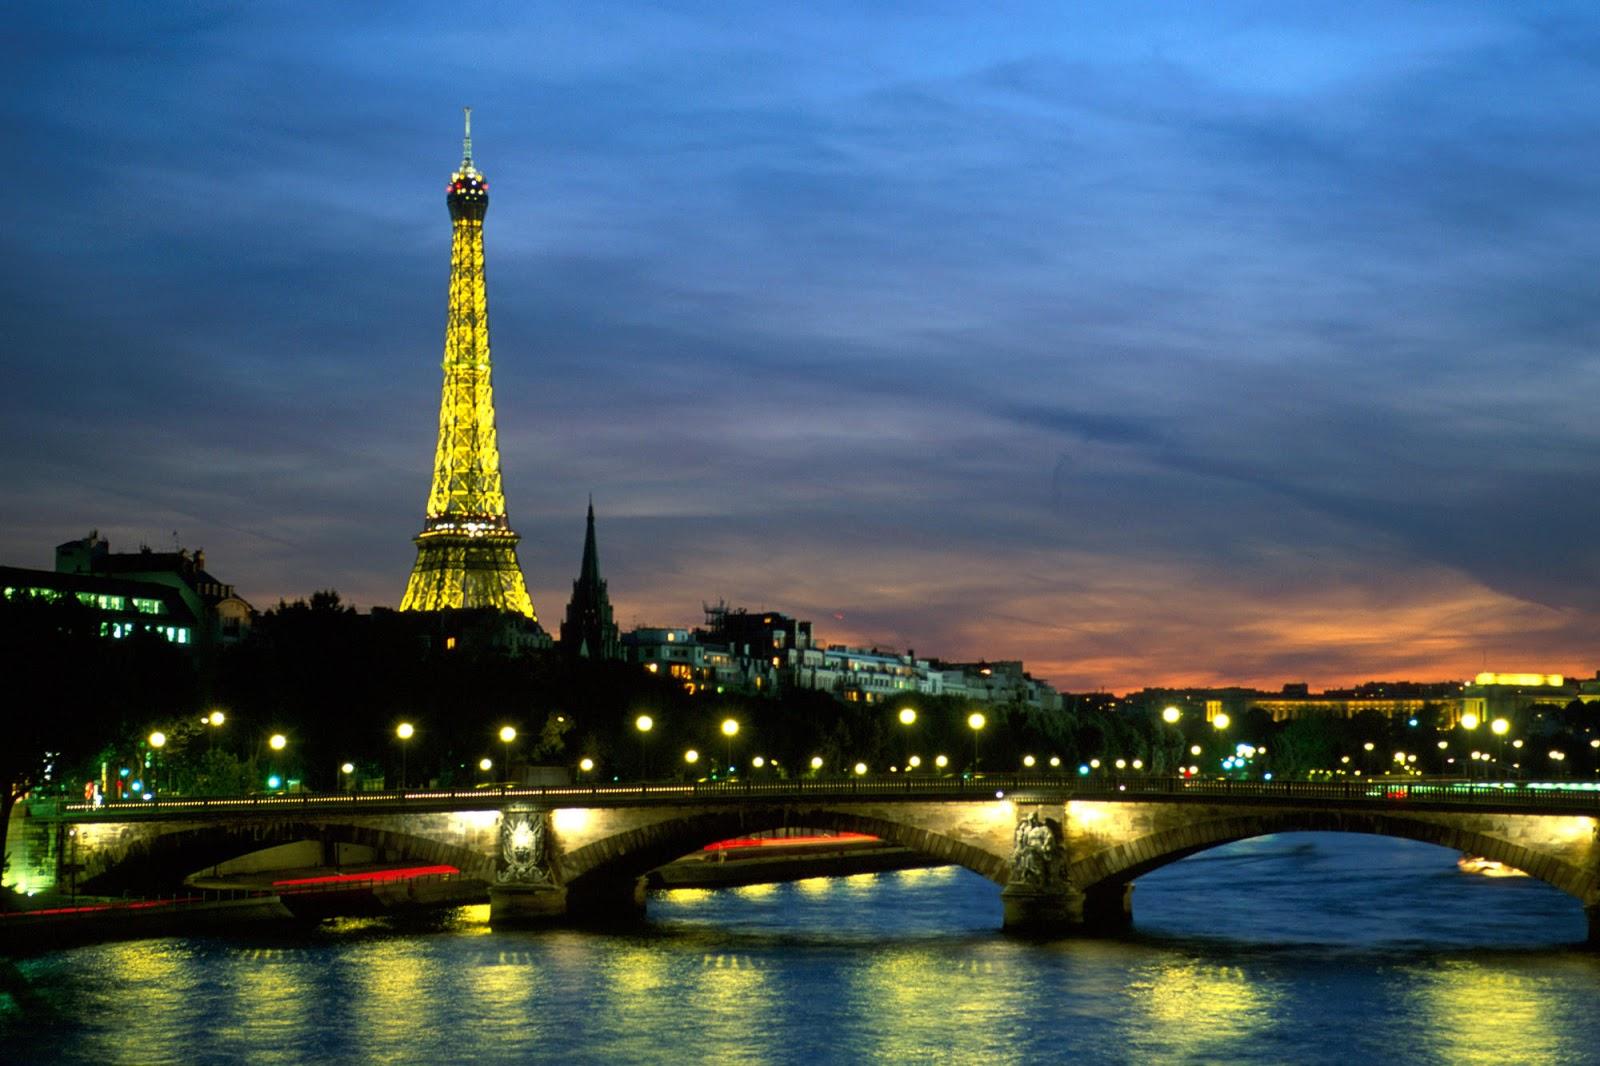 One Night In Paris Hd